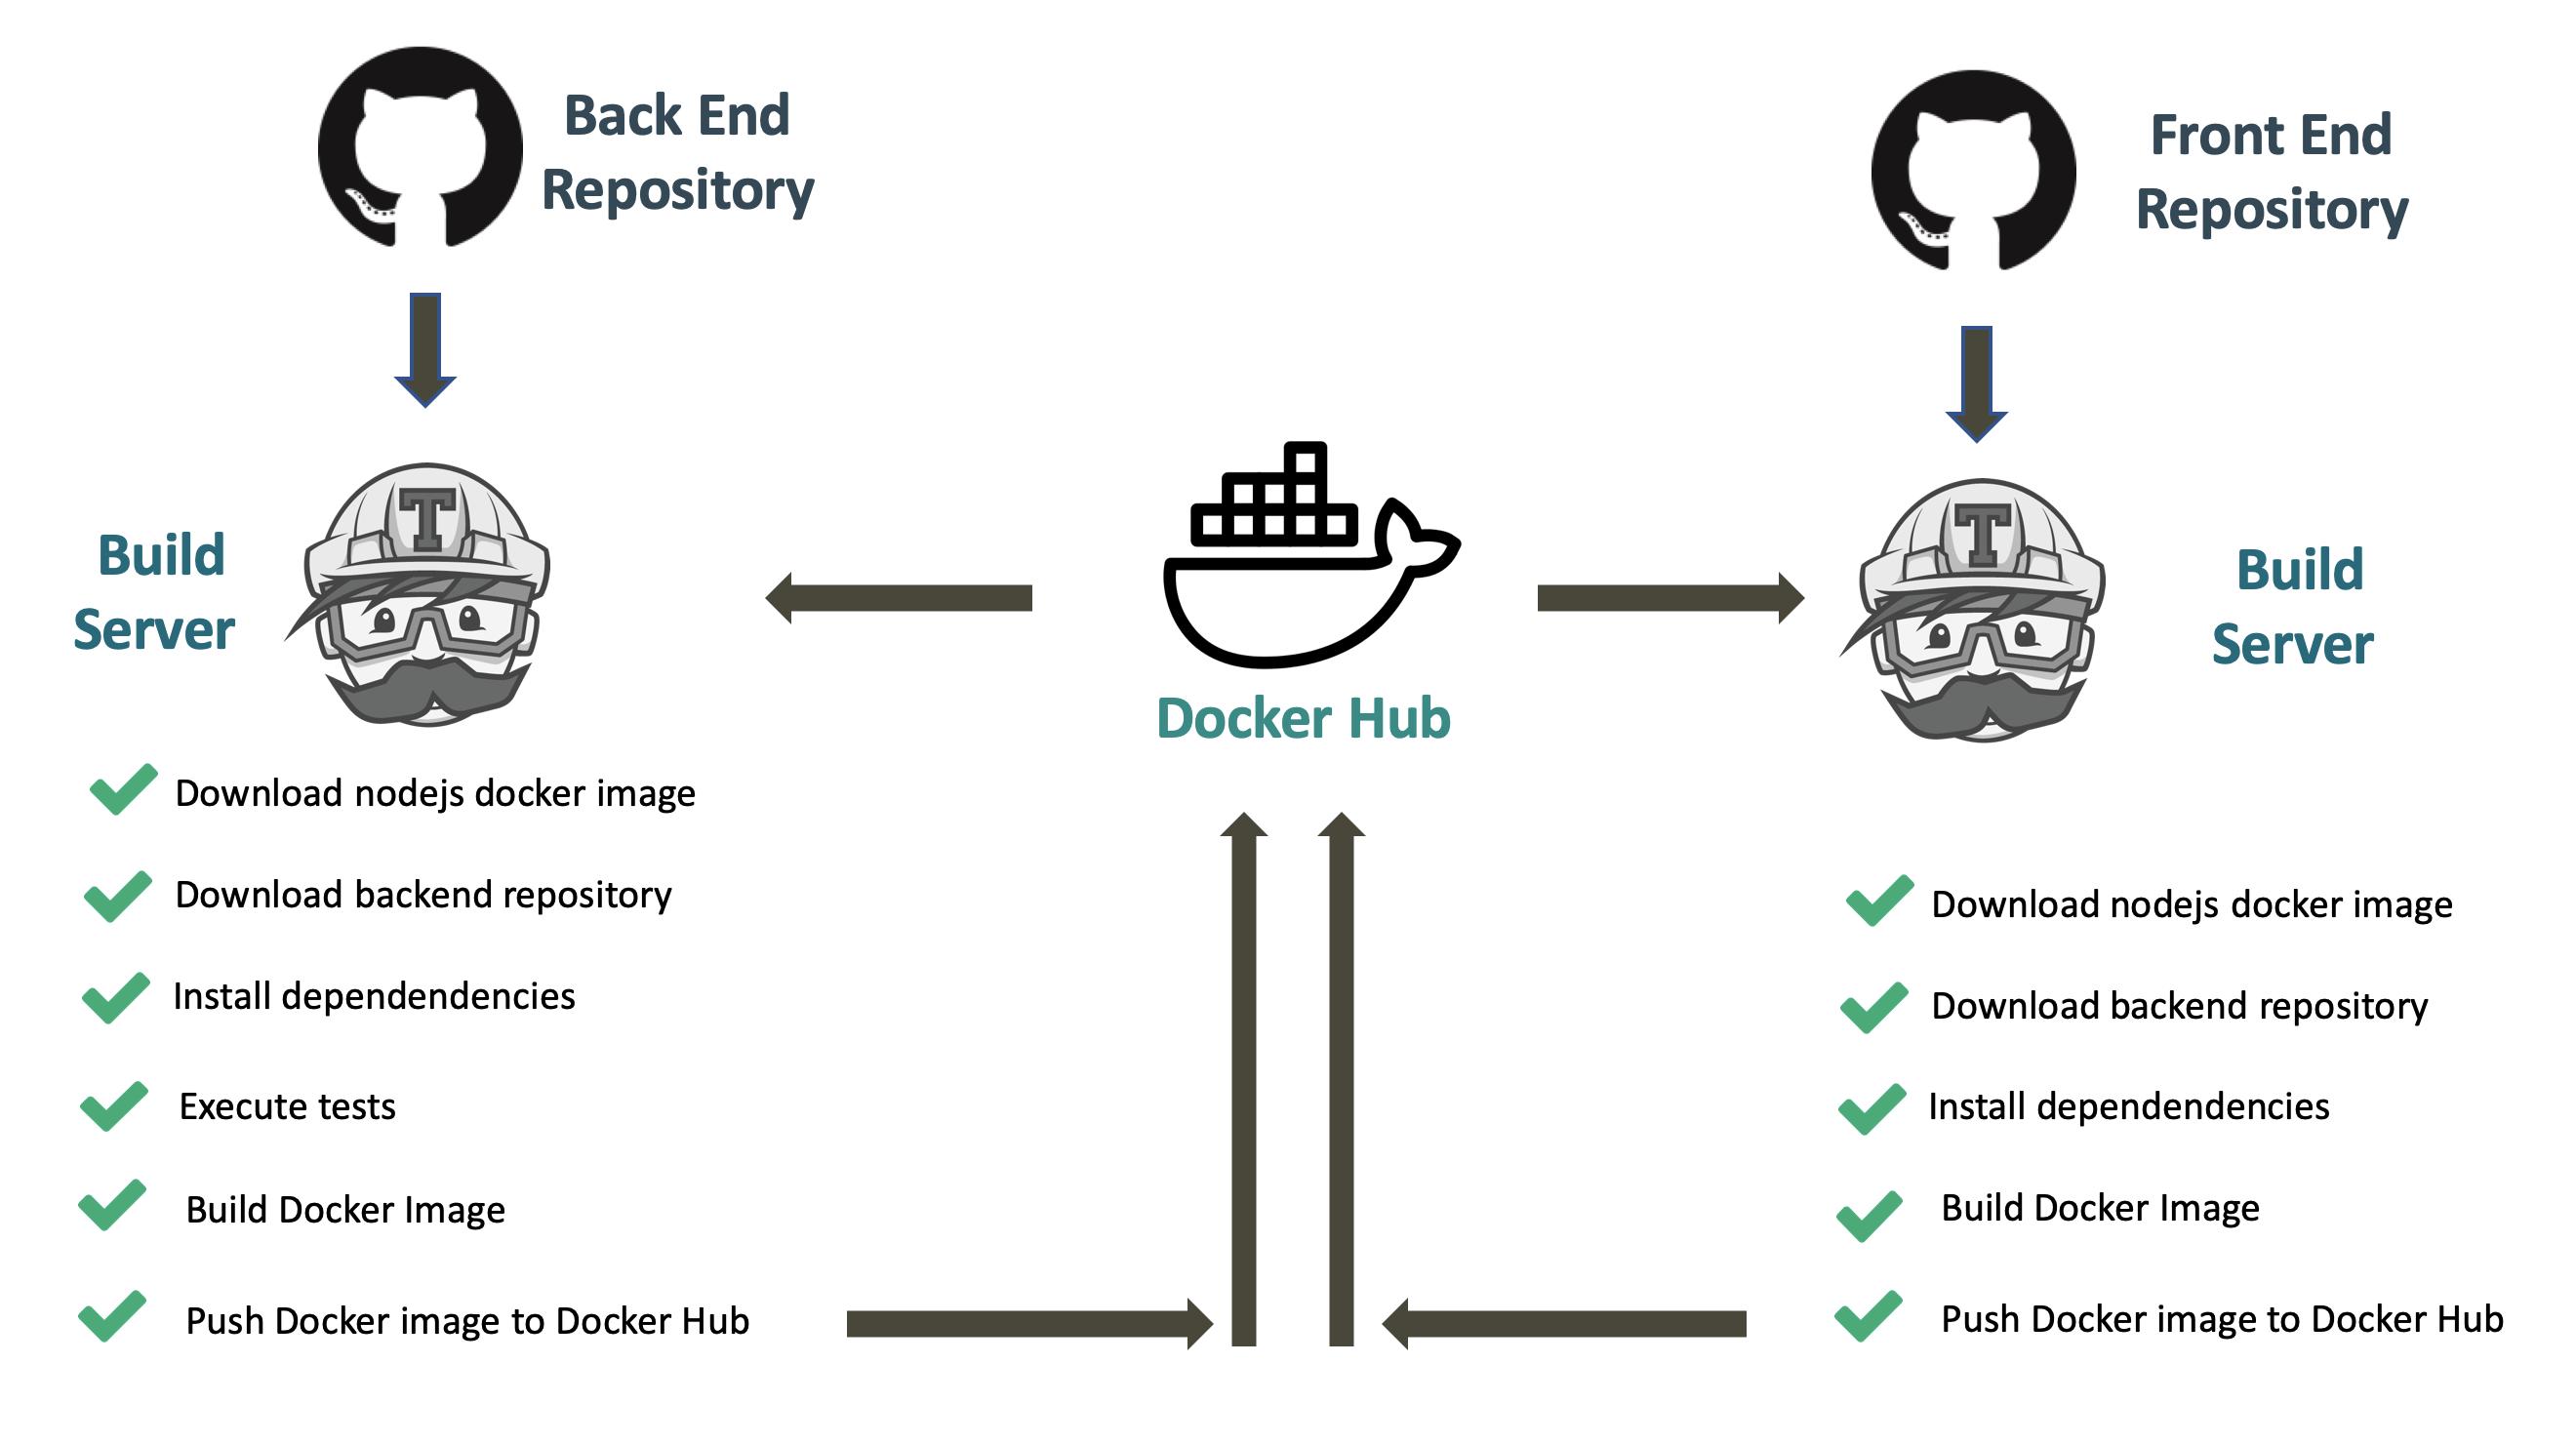 Build process summary